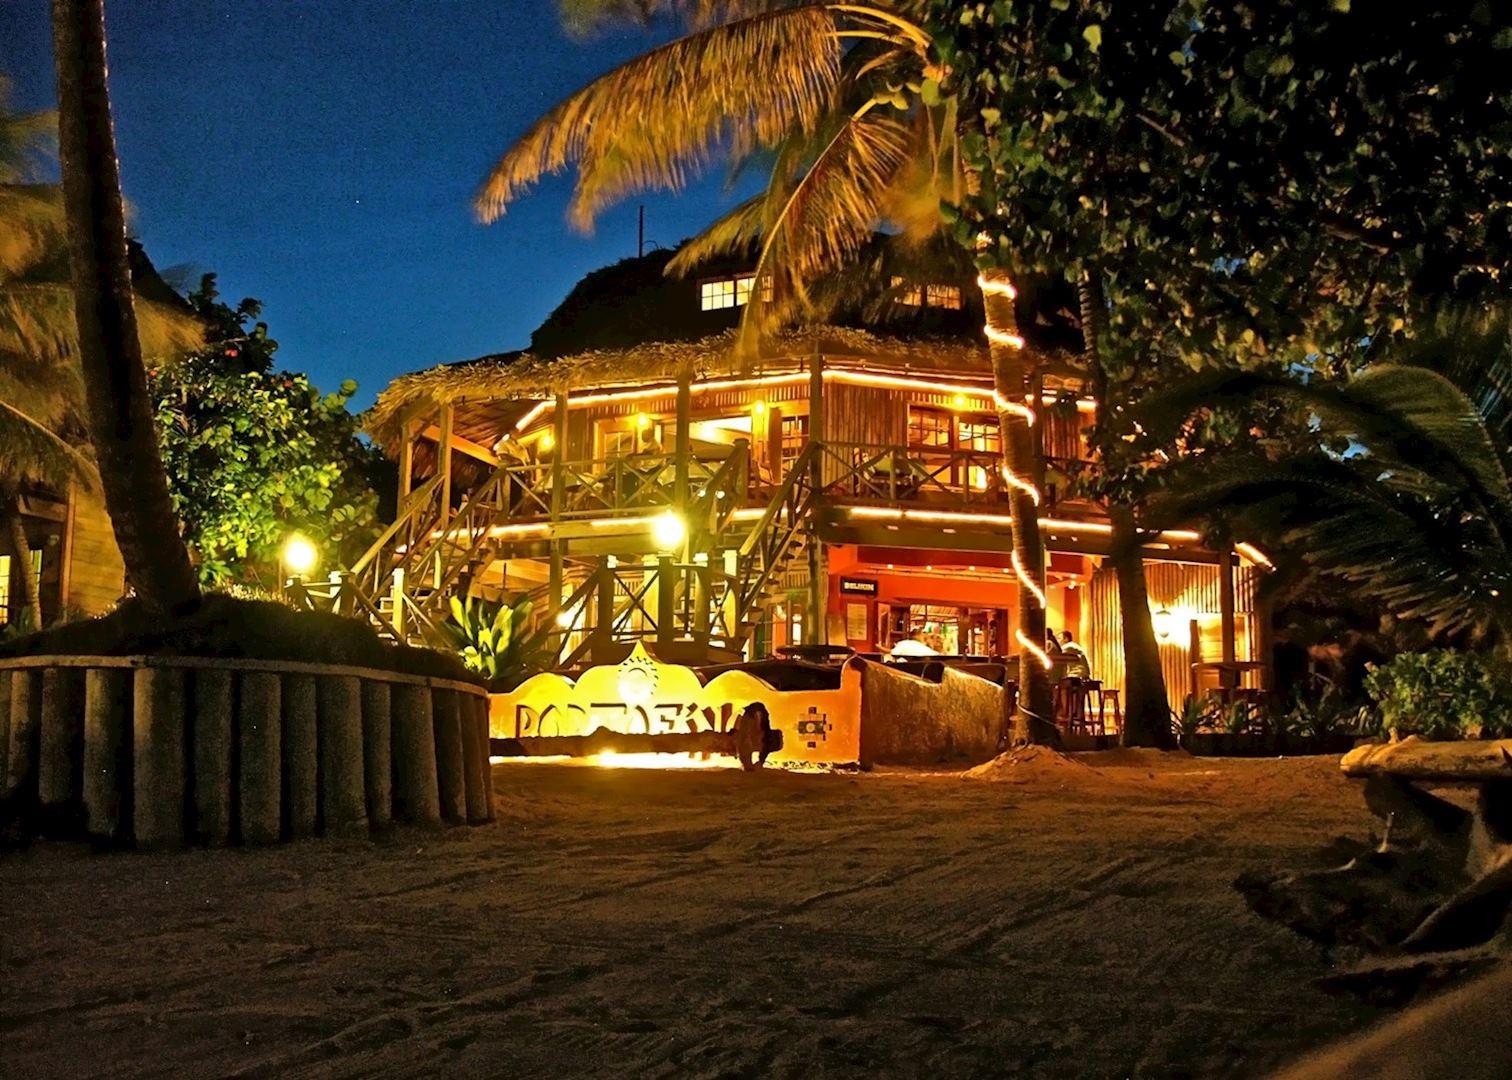 portofino beach resort the cayes hotels audley travel